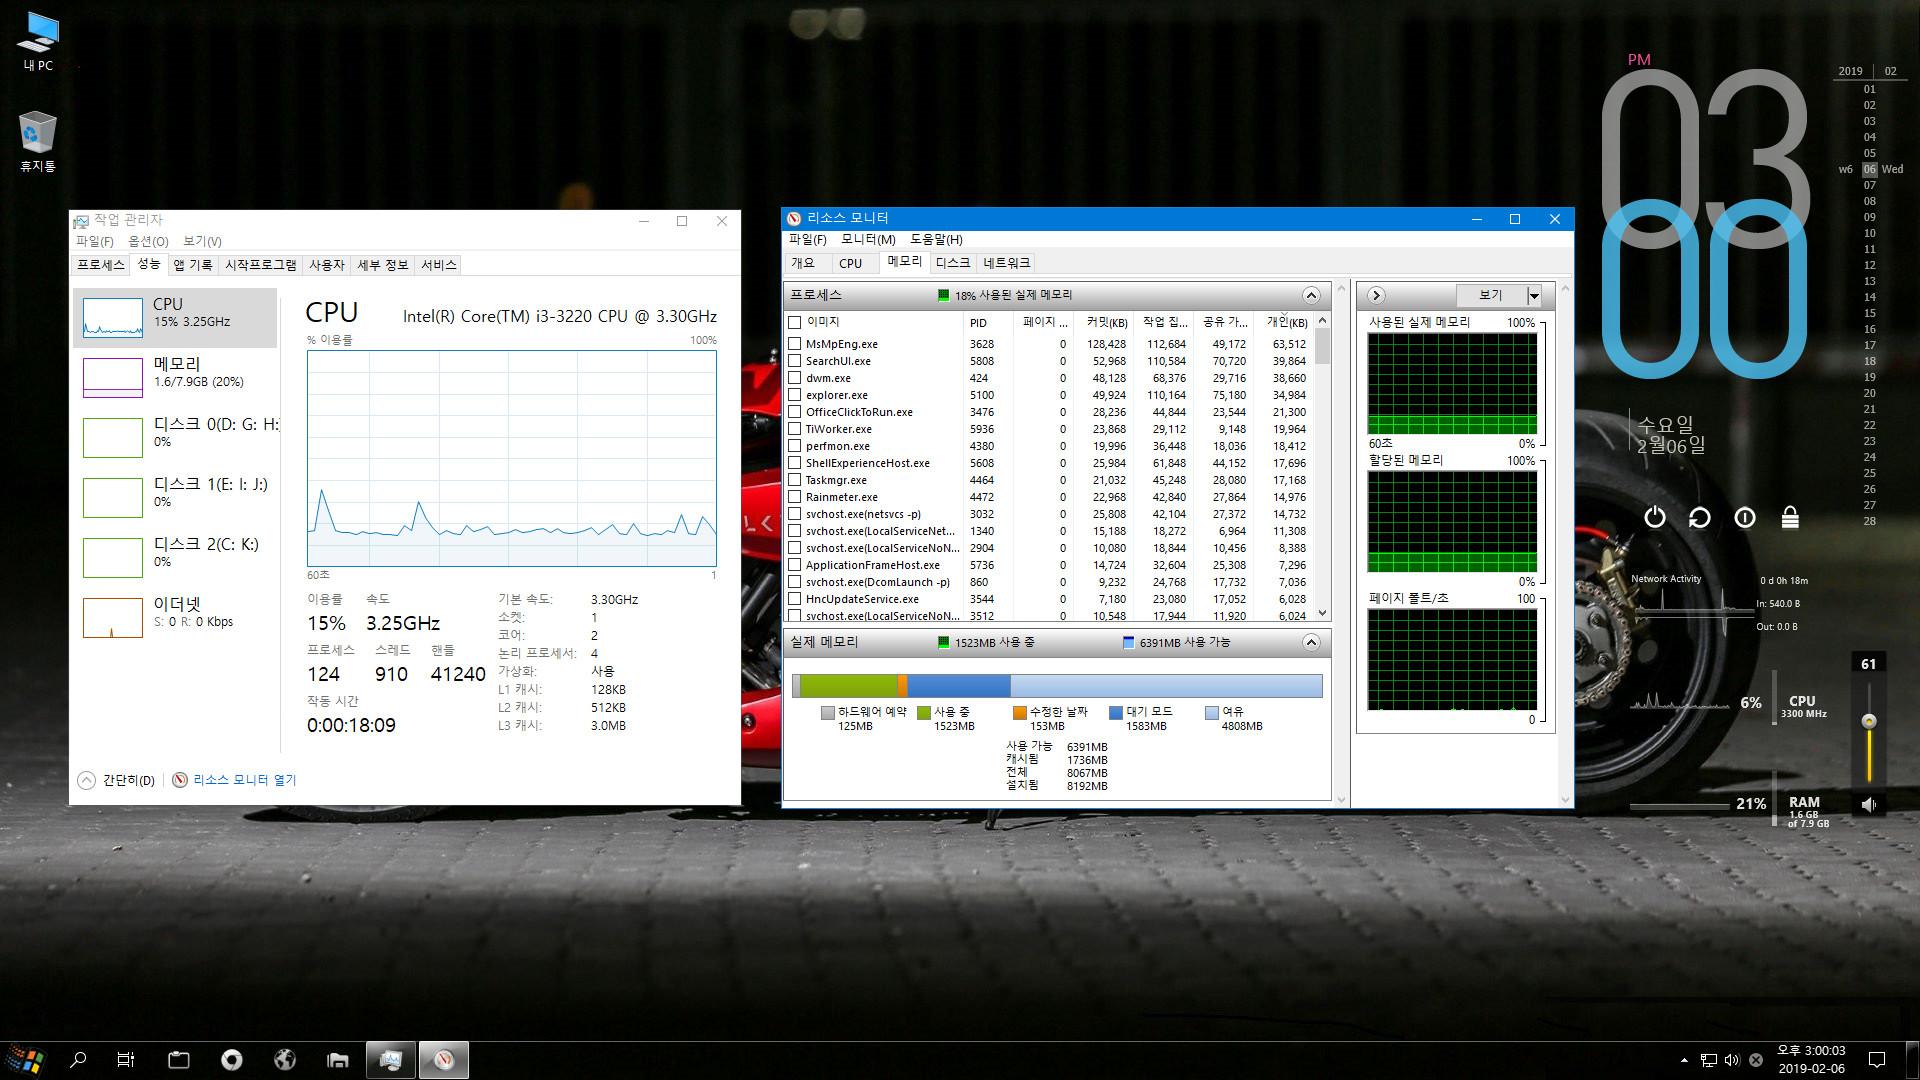 Workstations ST51_0007-01-01.jpg